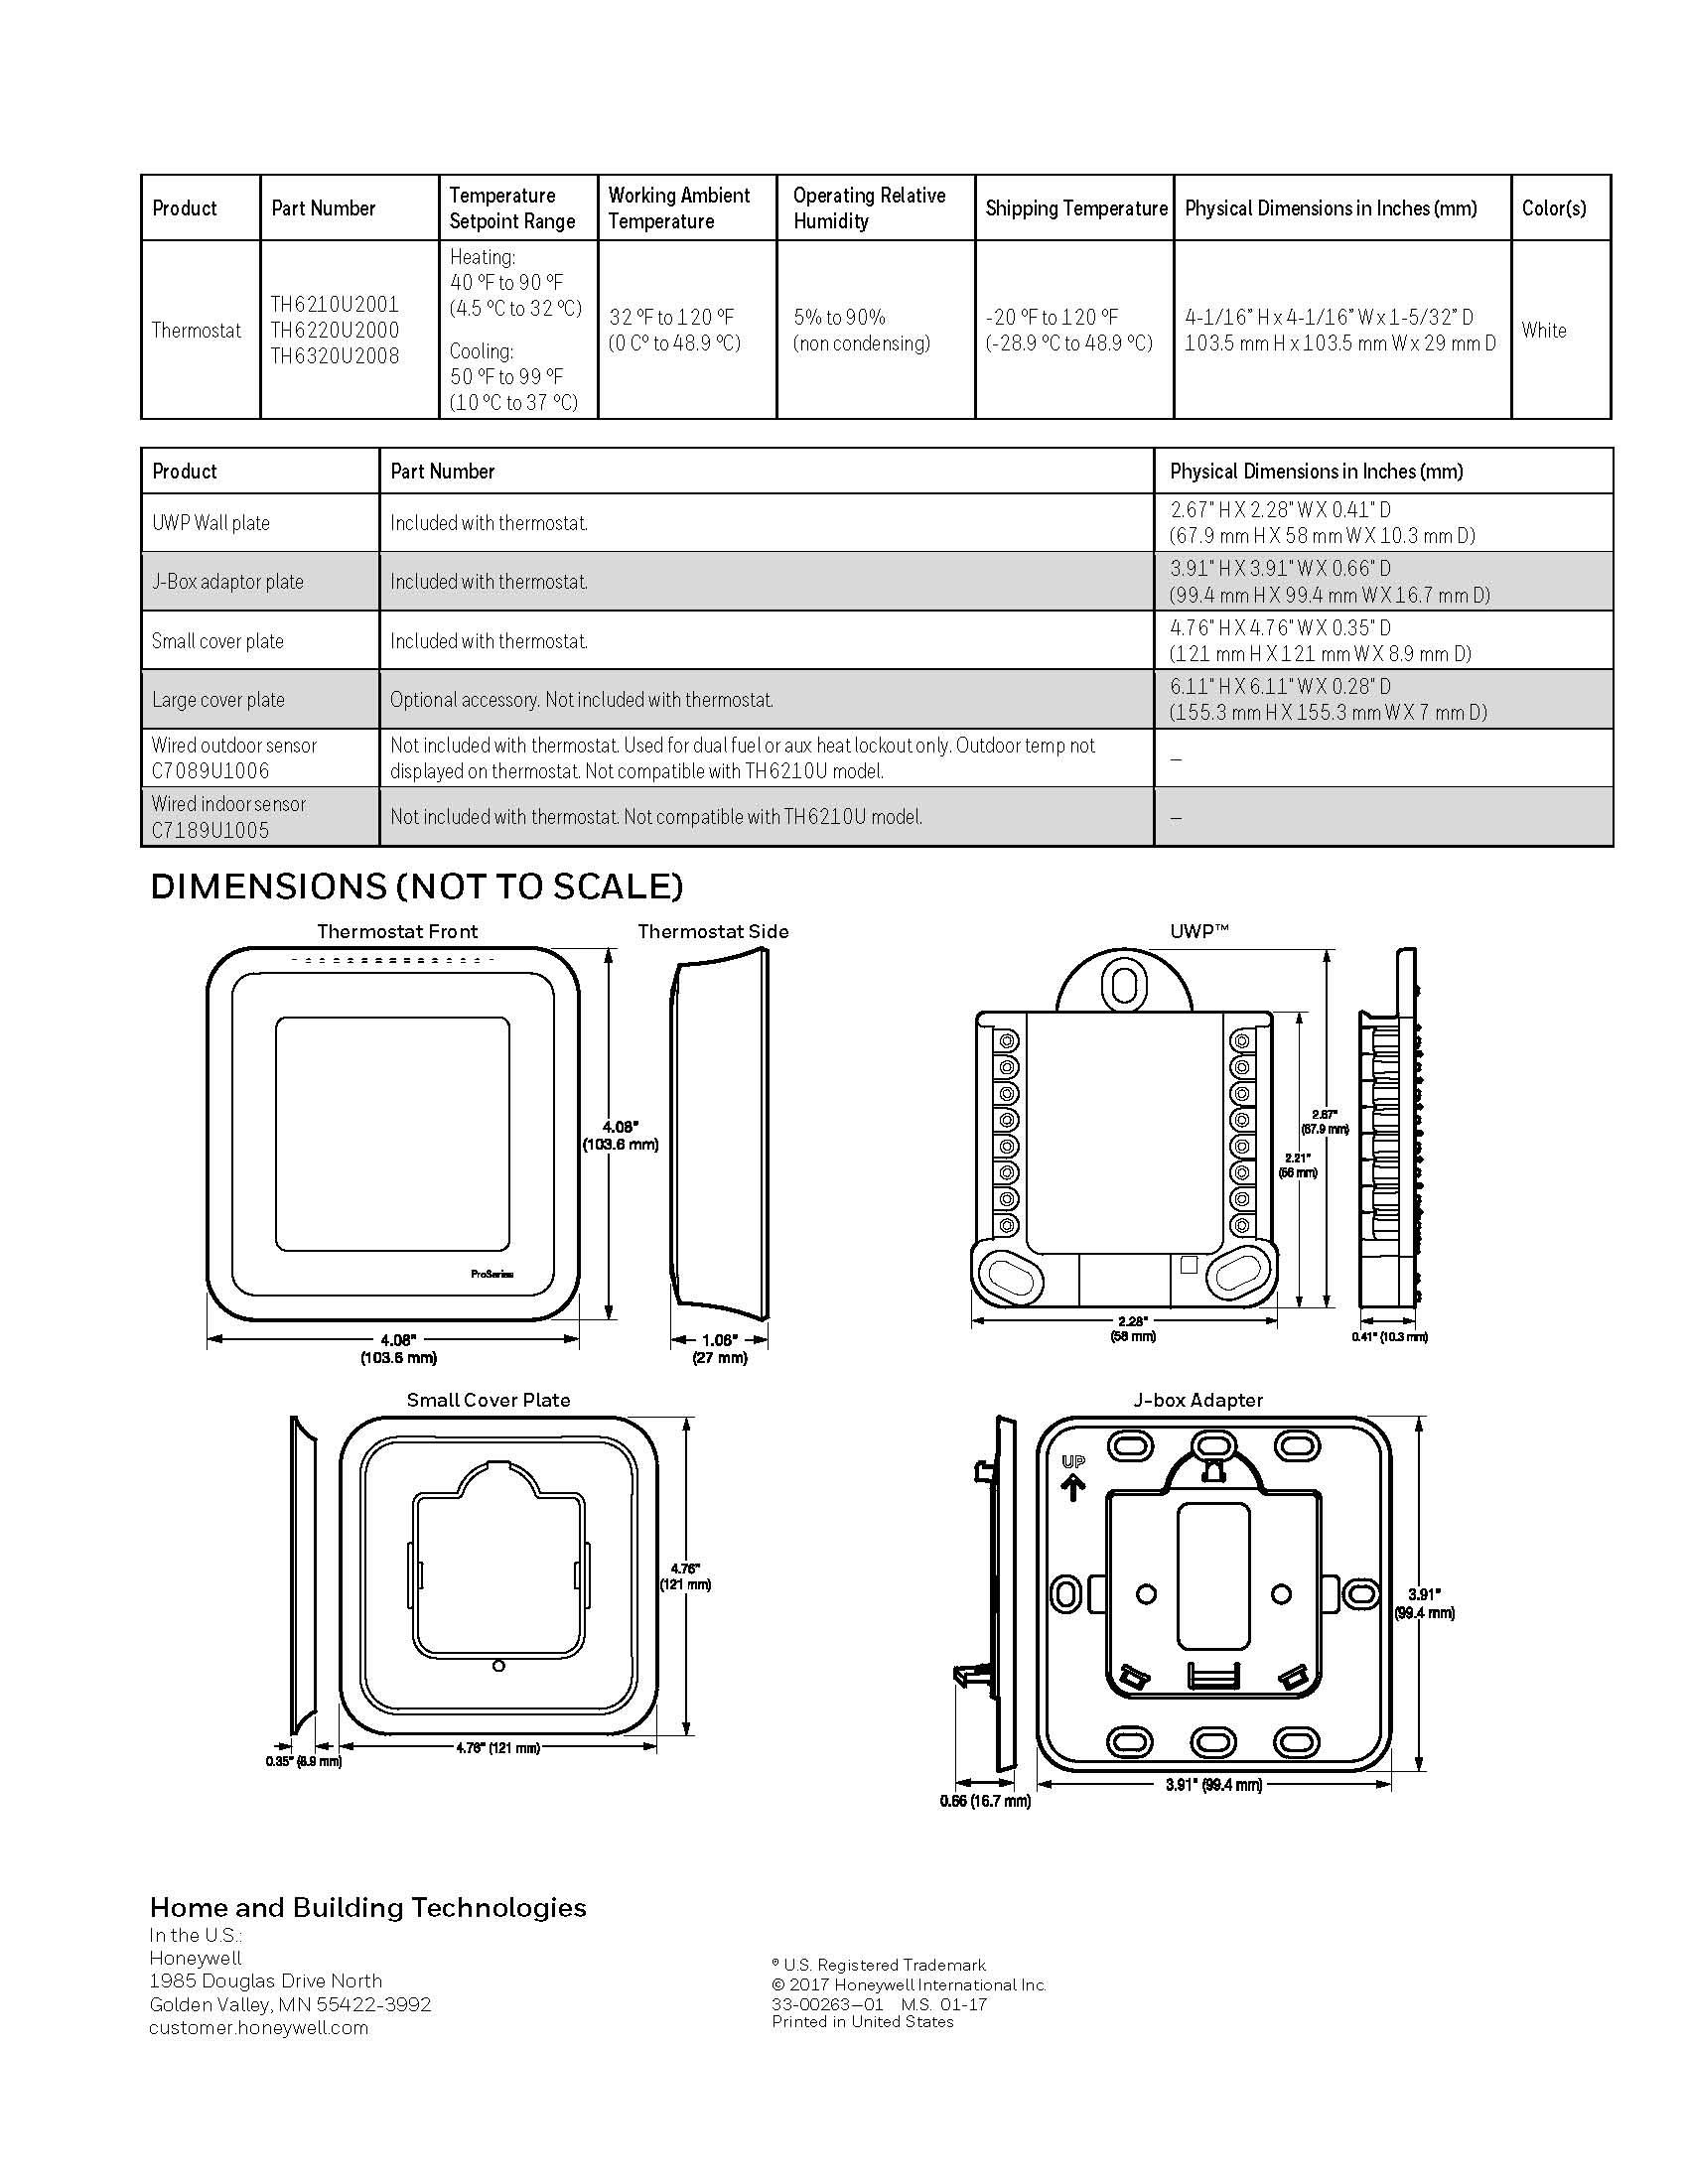 honeywell t6 pro thermostat 2h  1c programmable th6210u2001